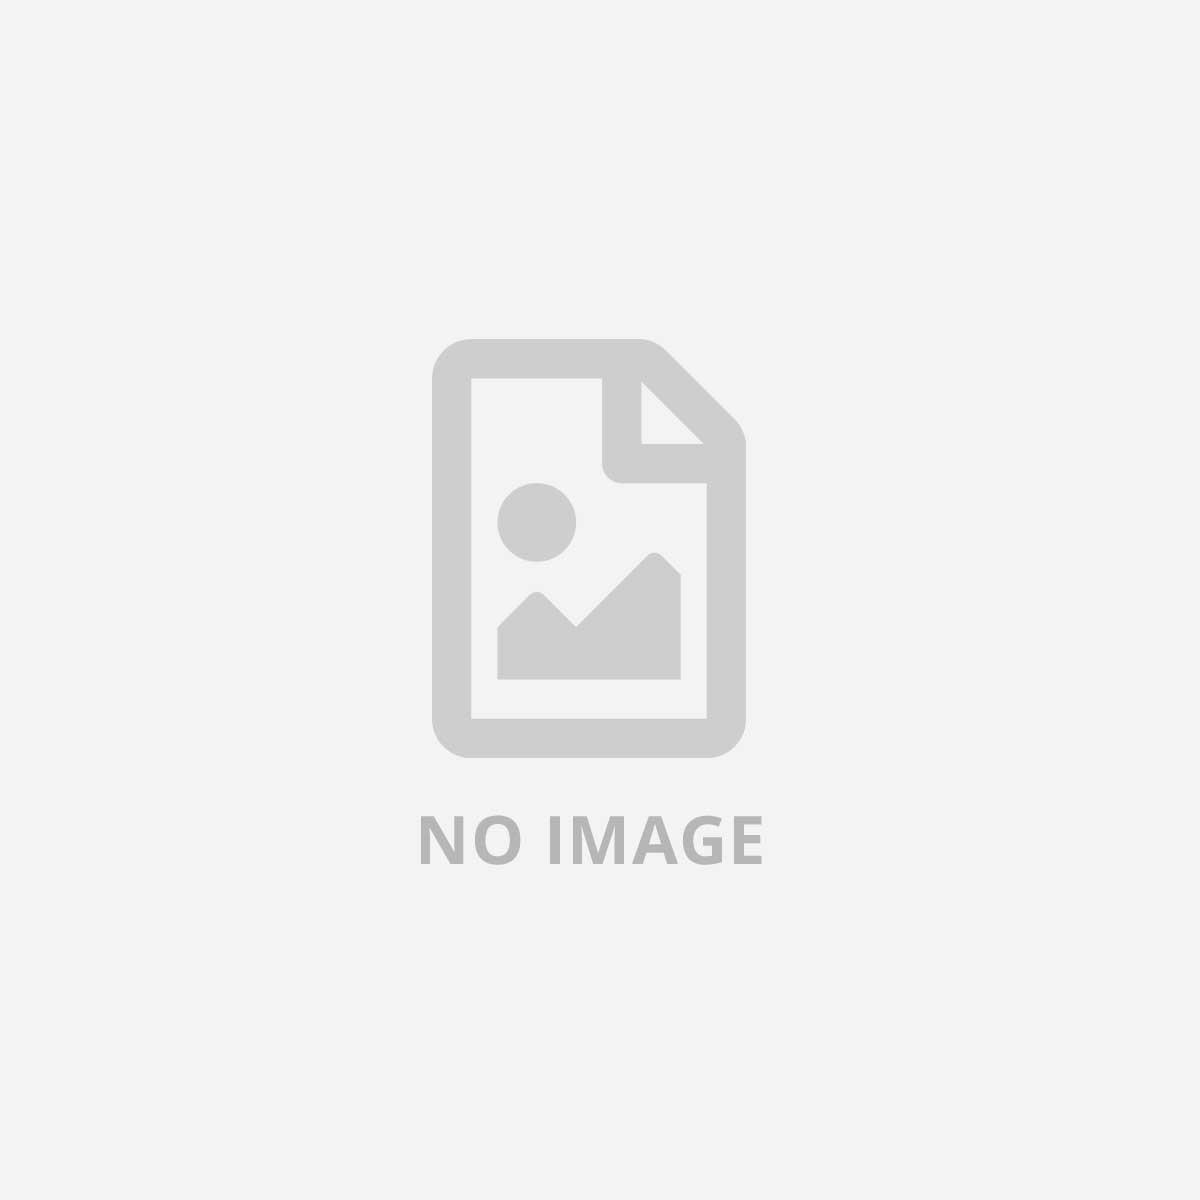 ZENPAY 3G RETAIL PACKAGE - IT